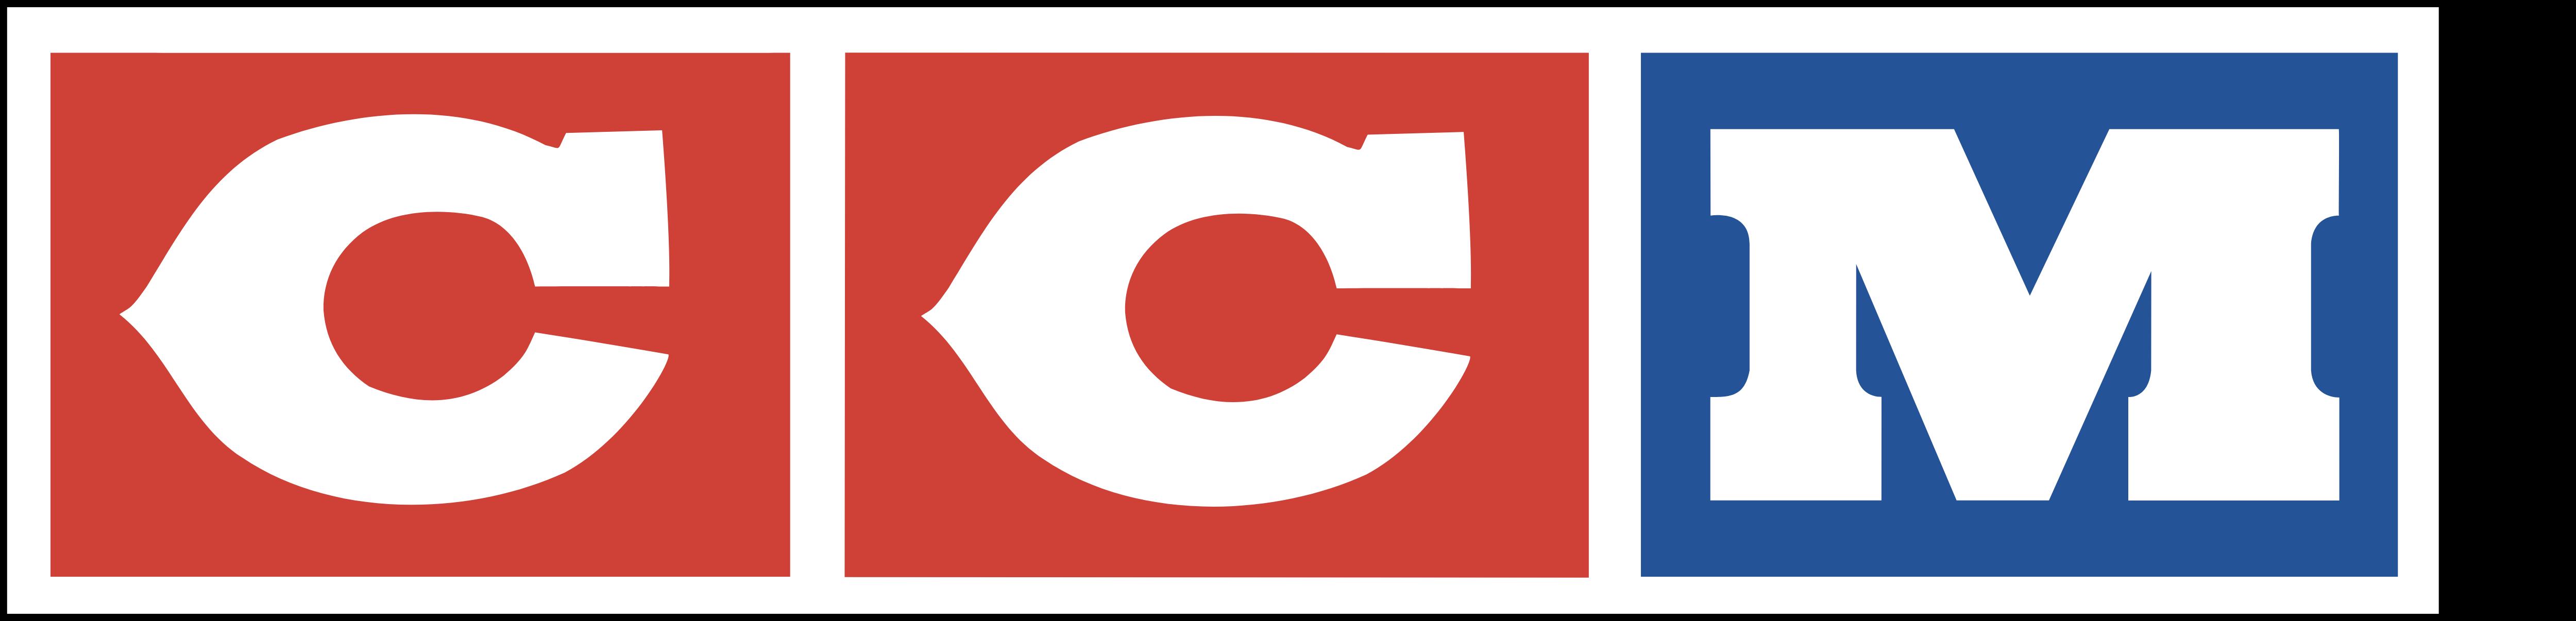 CCM Hockey Equip – Logos Download